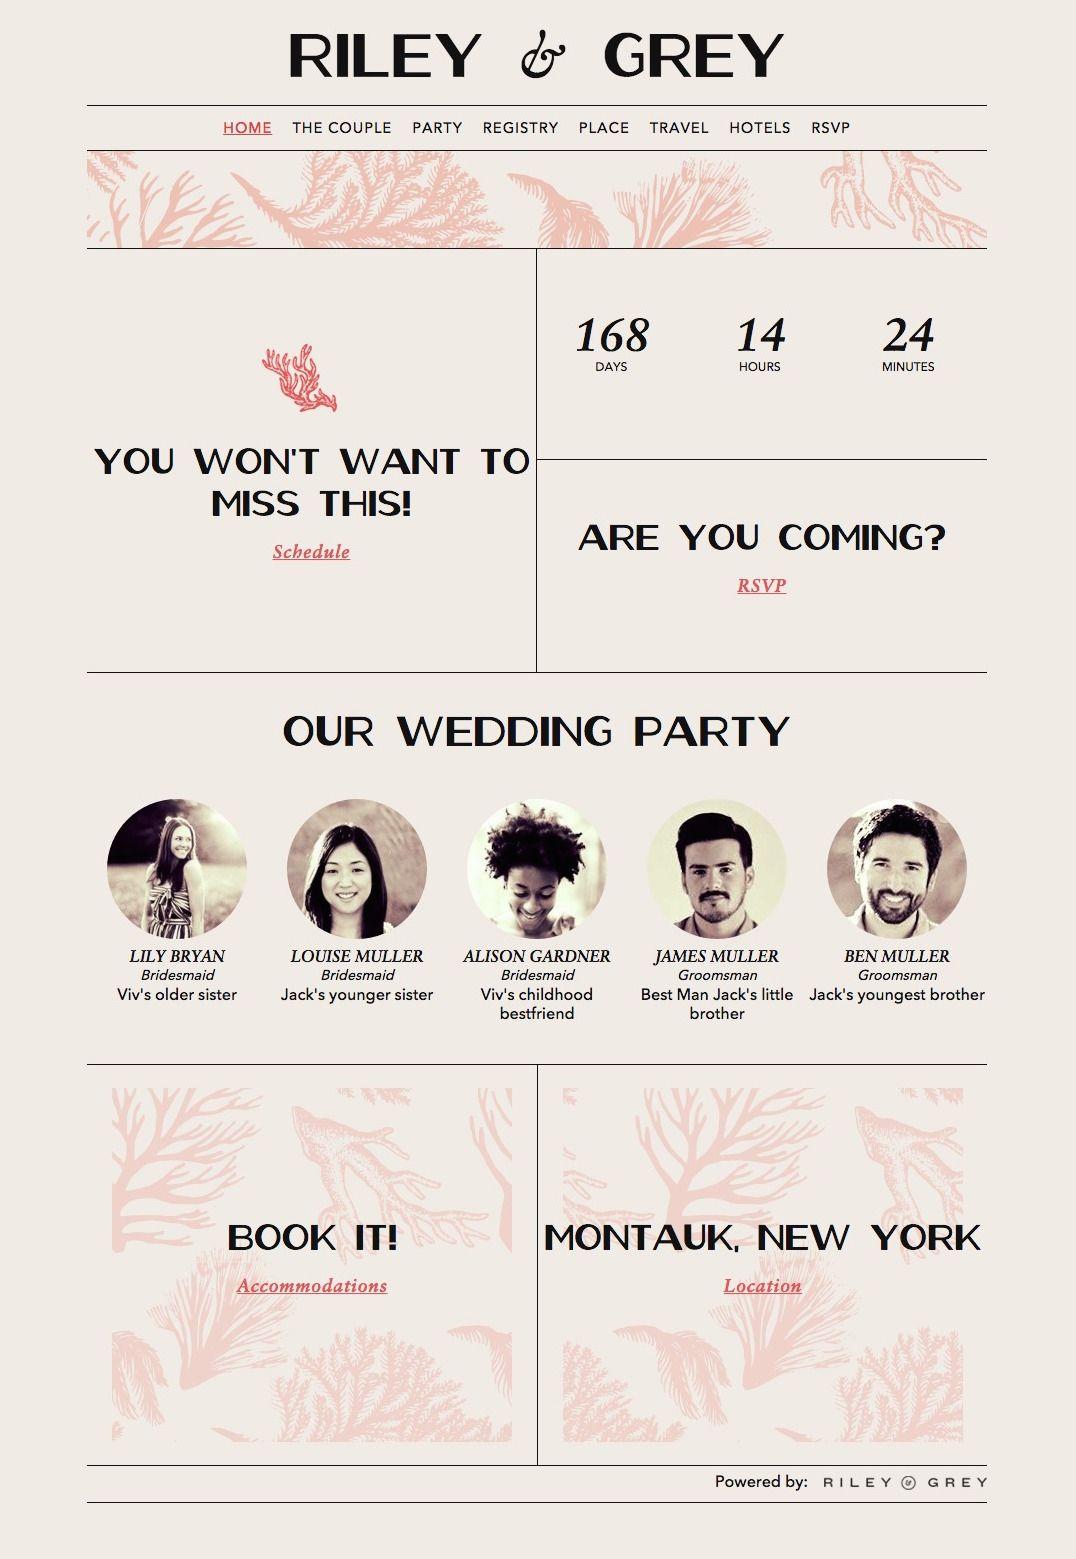 beach wedding invitation wedding website example RILEY